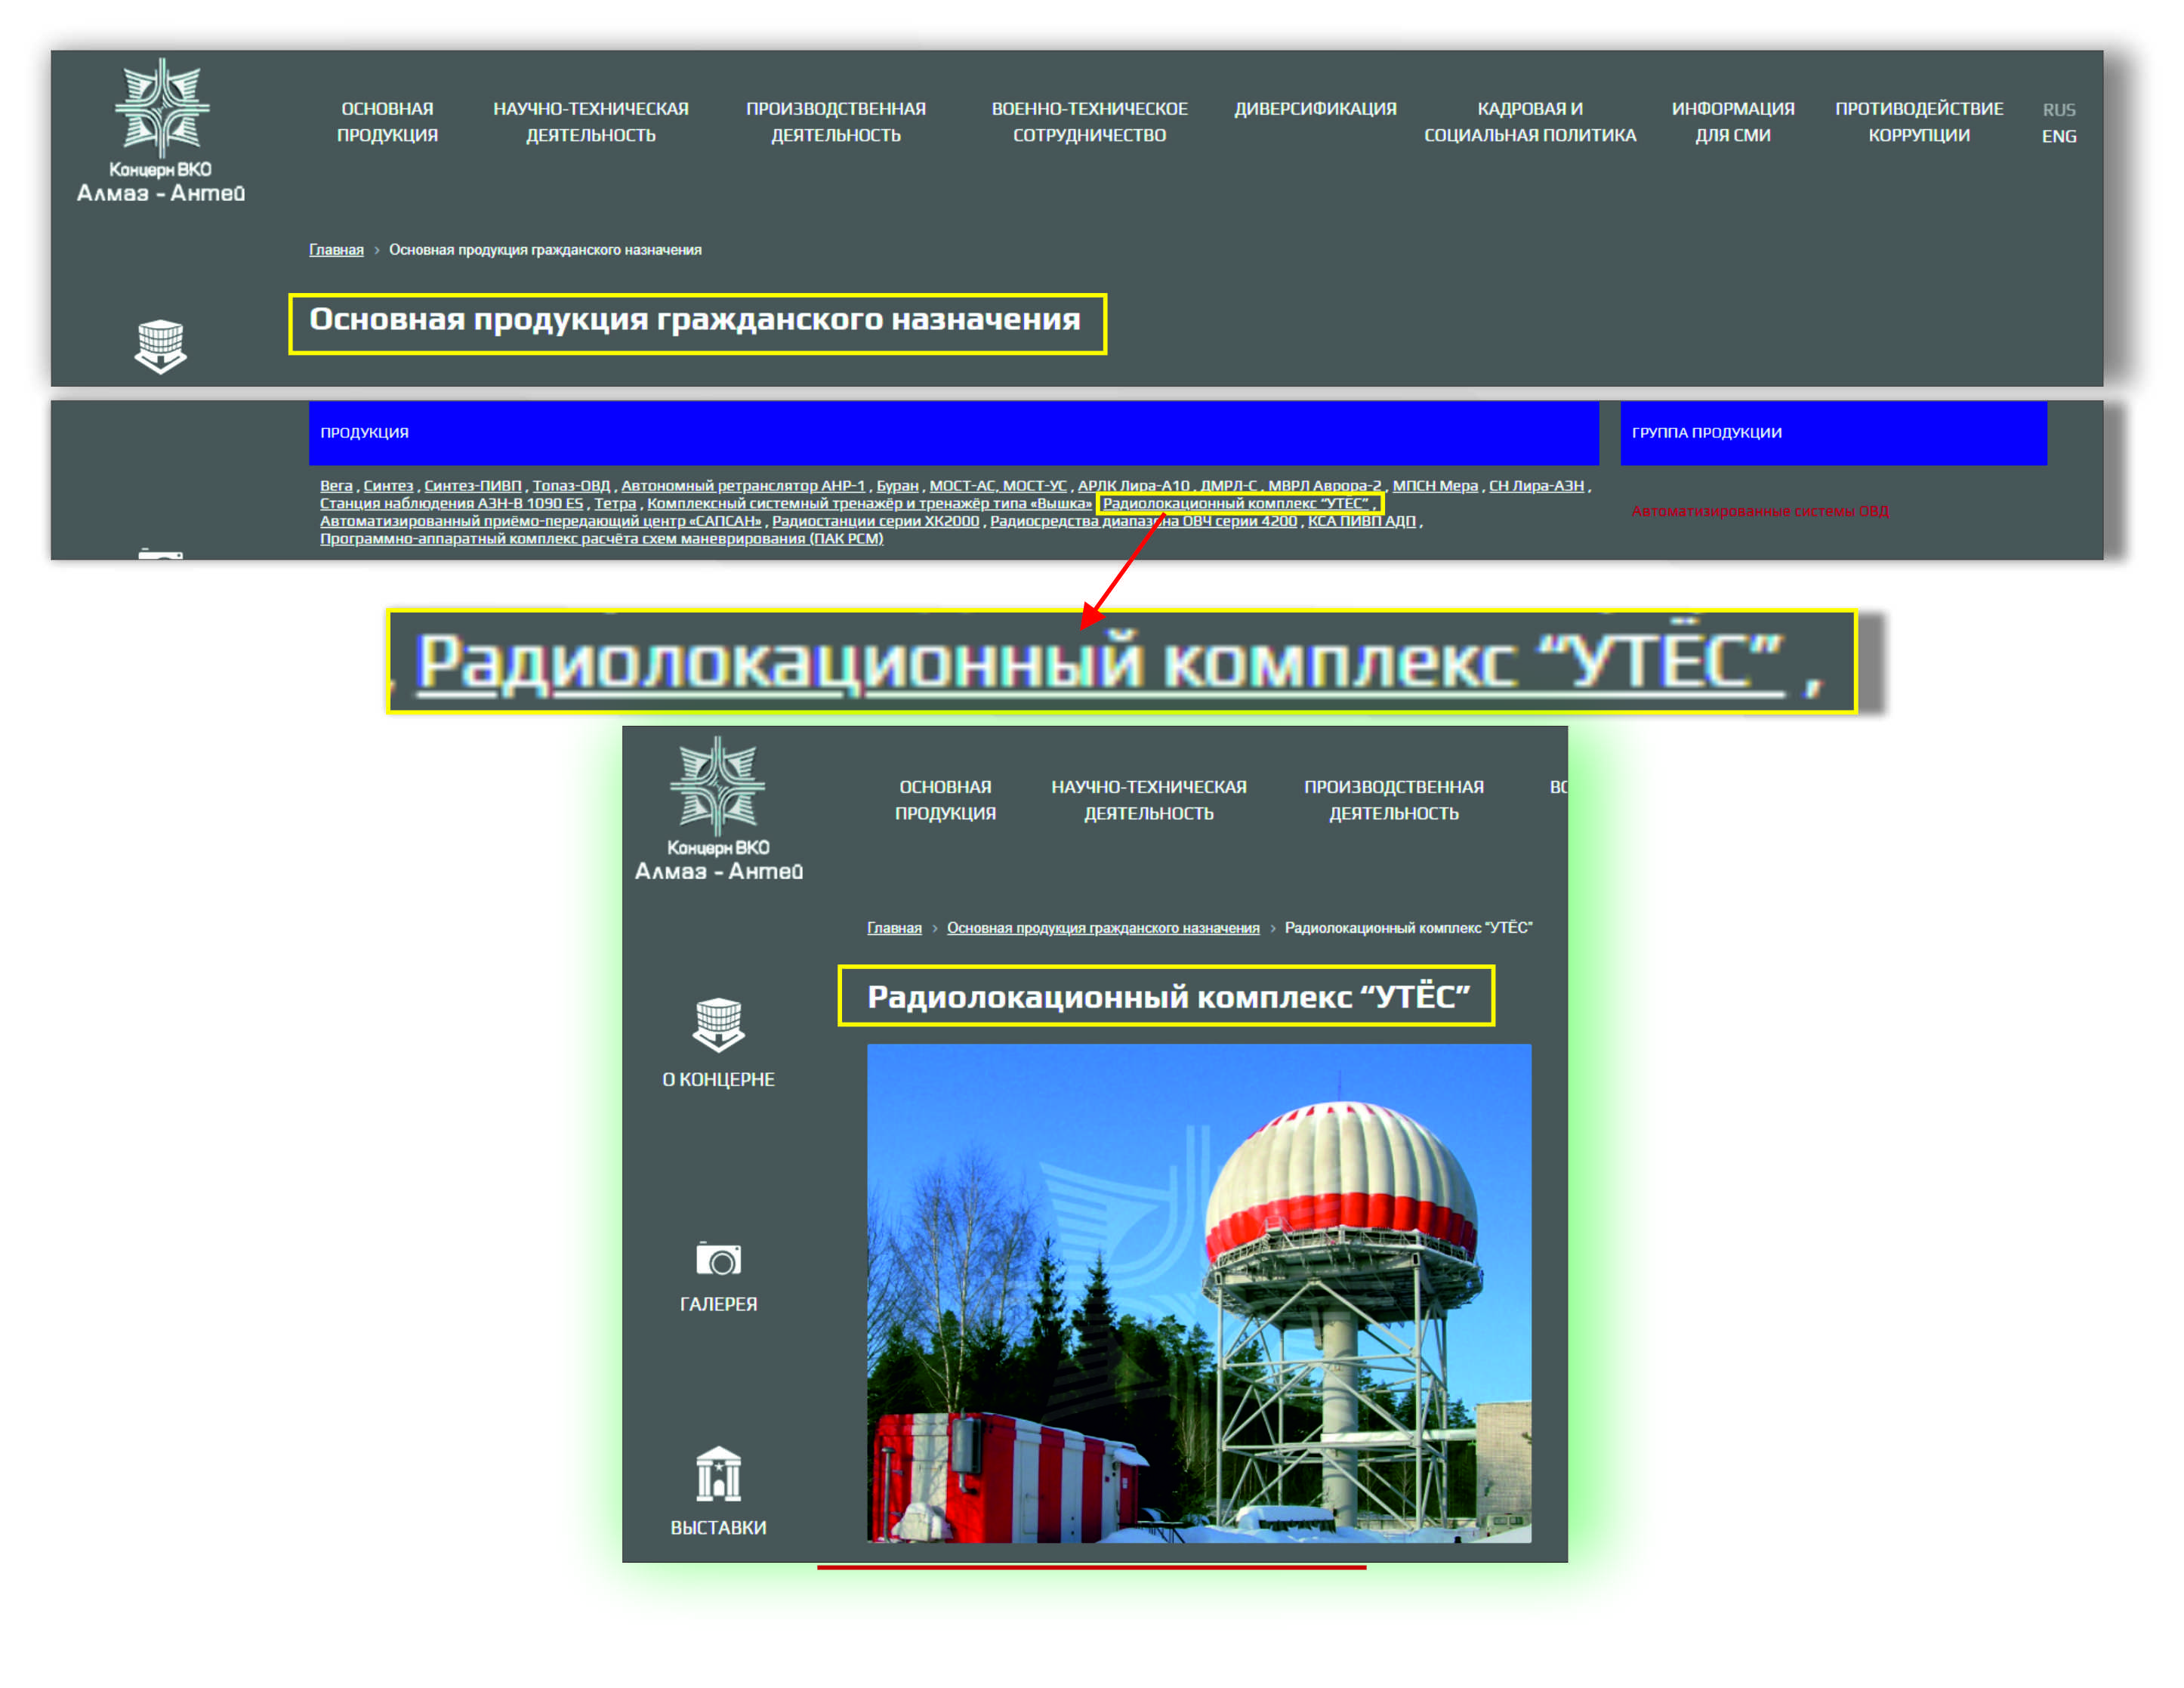 http://images.vfl.ru/ii/1622517077/30056c48/34661366.jpg